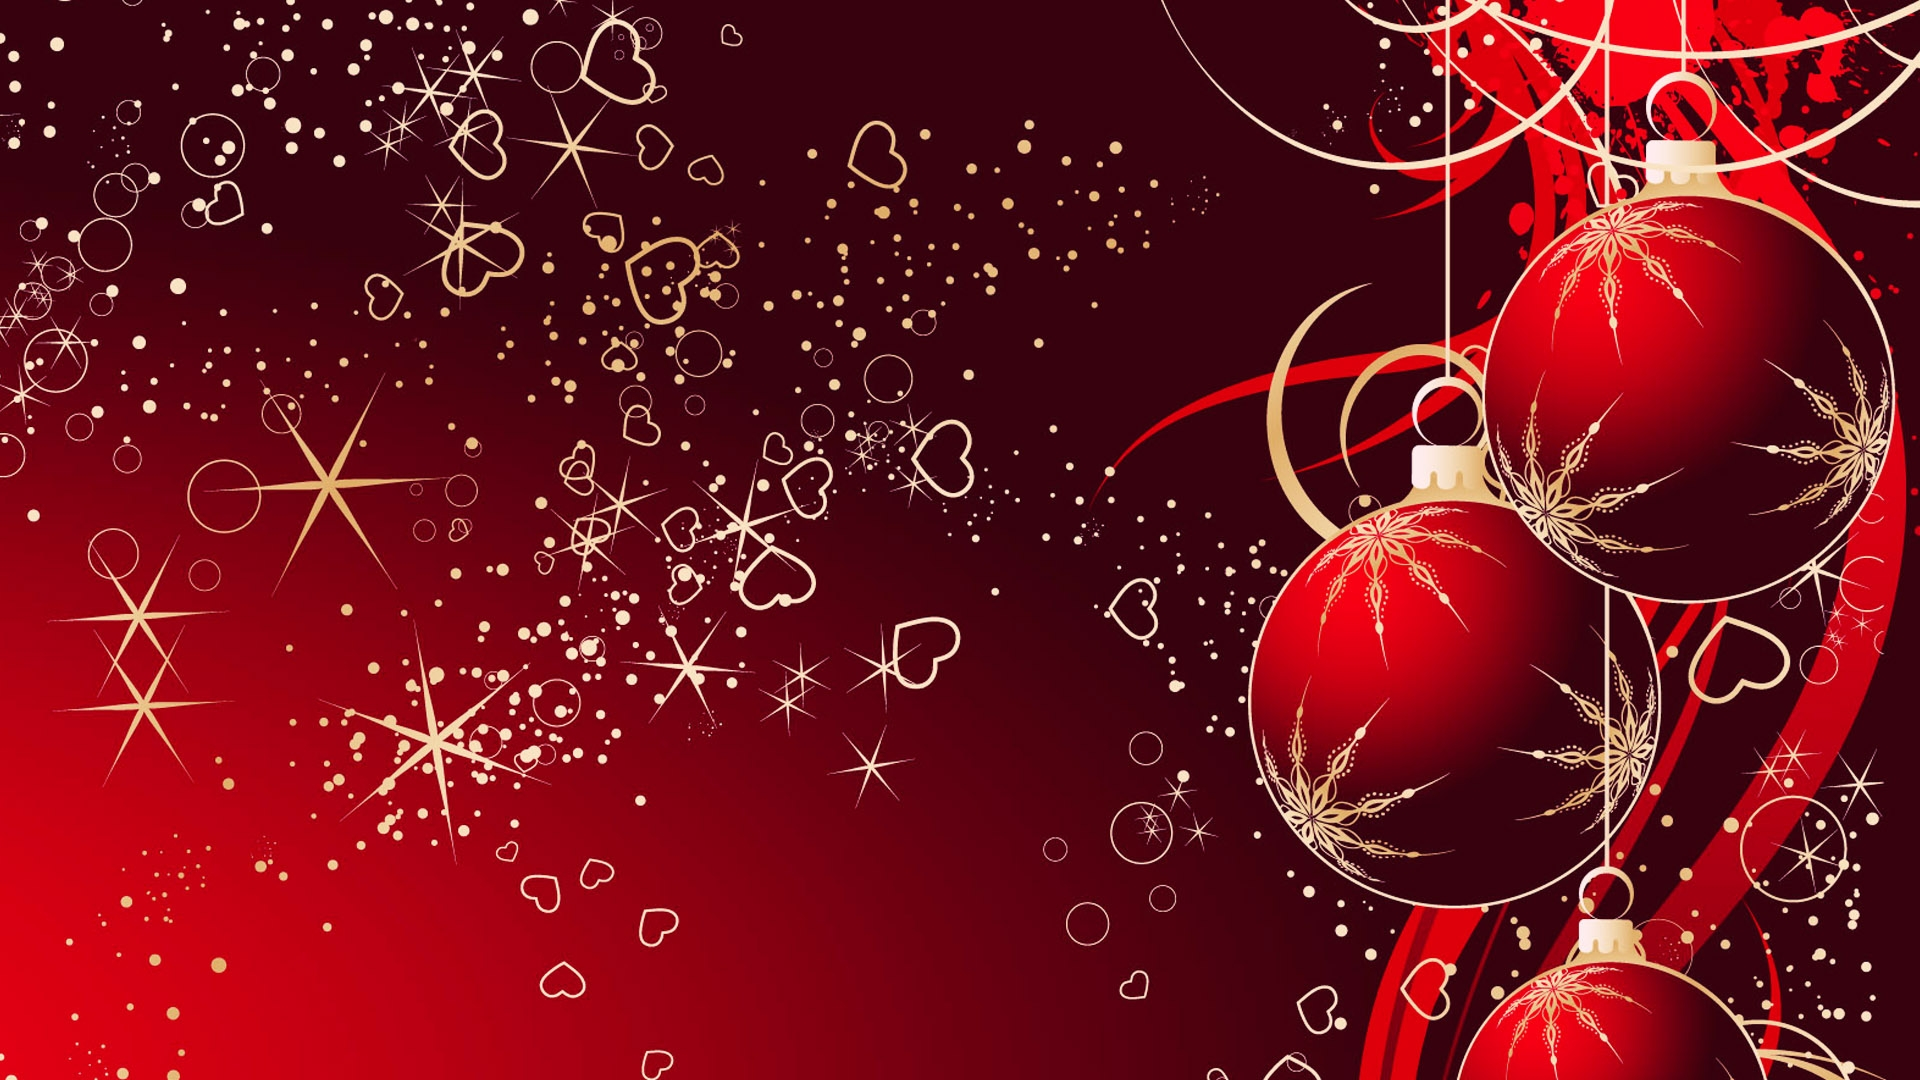 image jingle bell christmas wallpaper for 1920x1080 hdtv 1080p